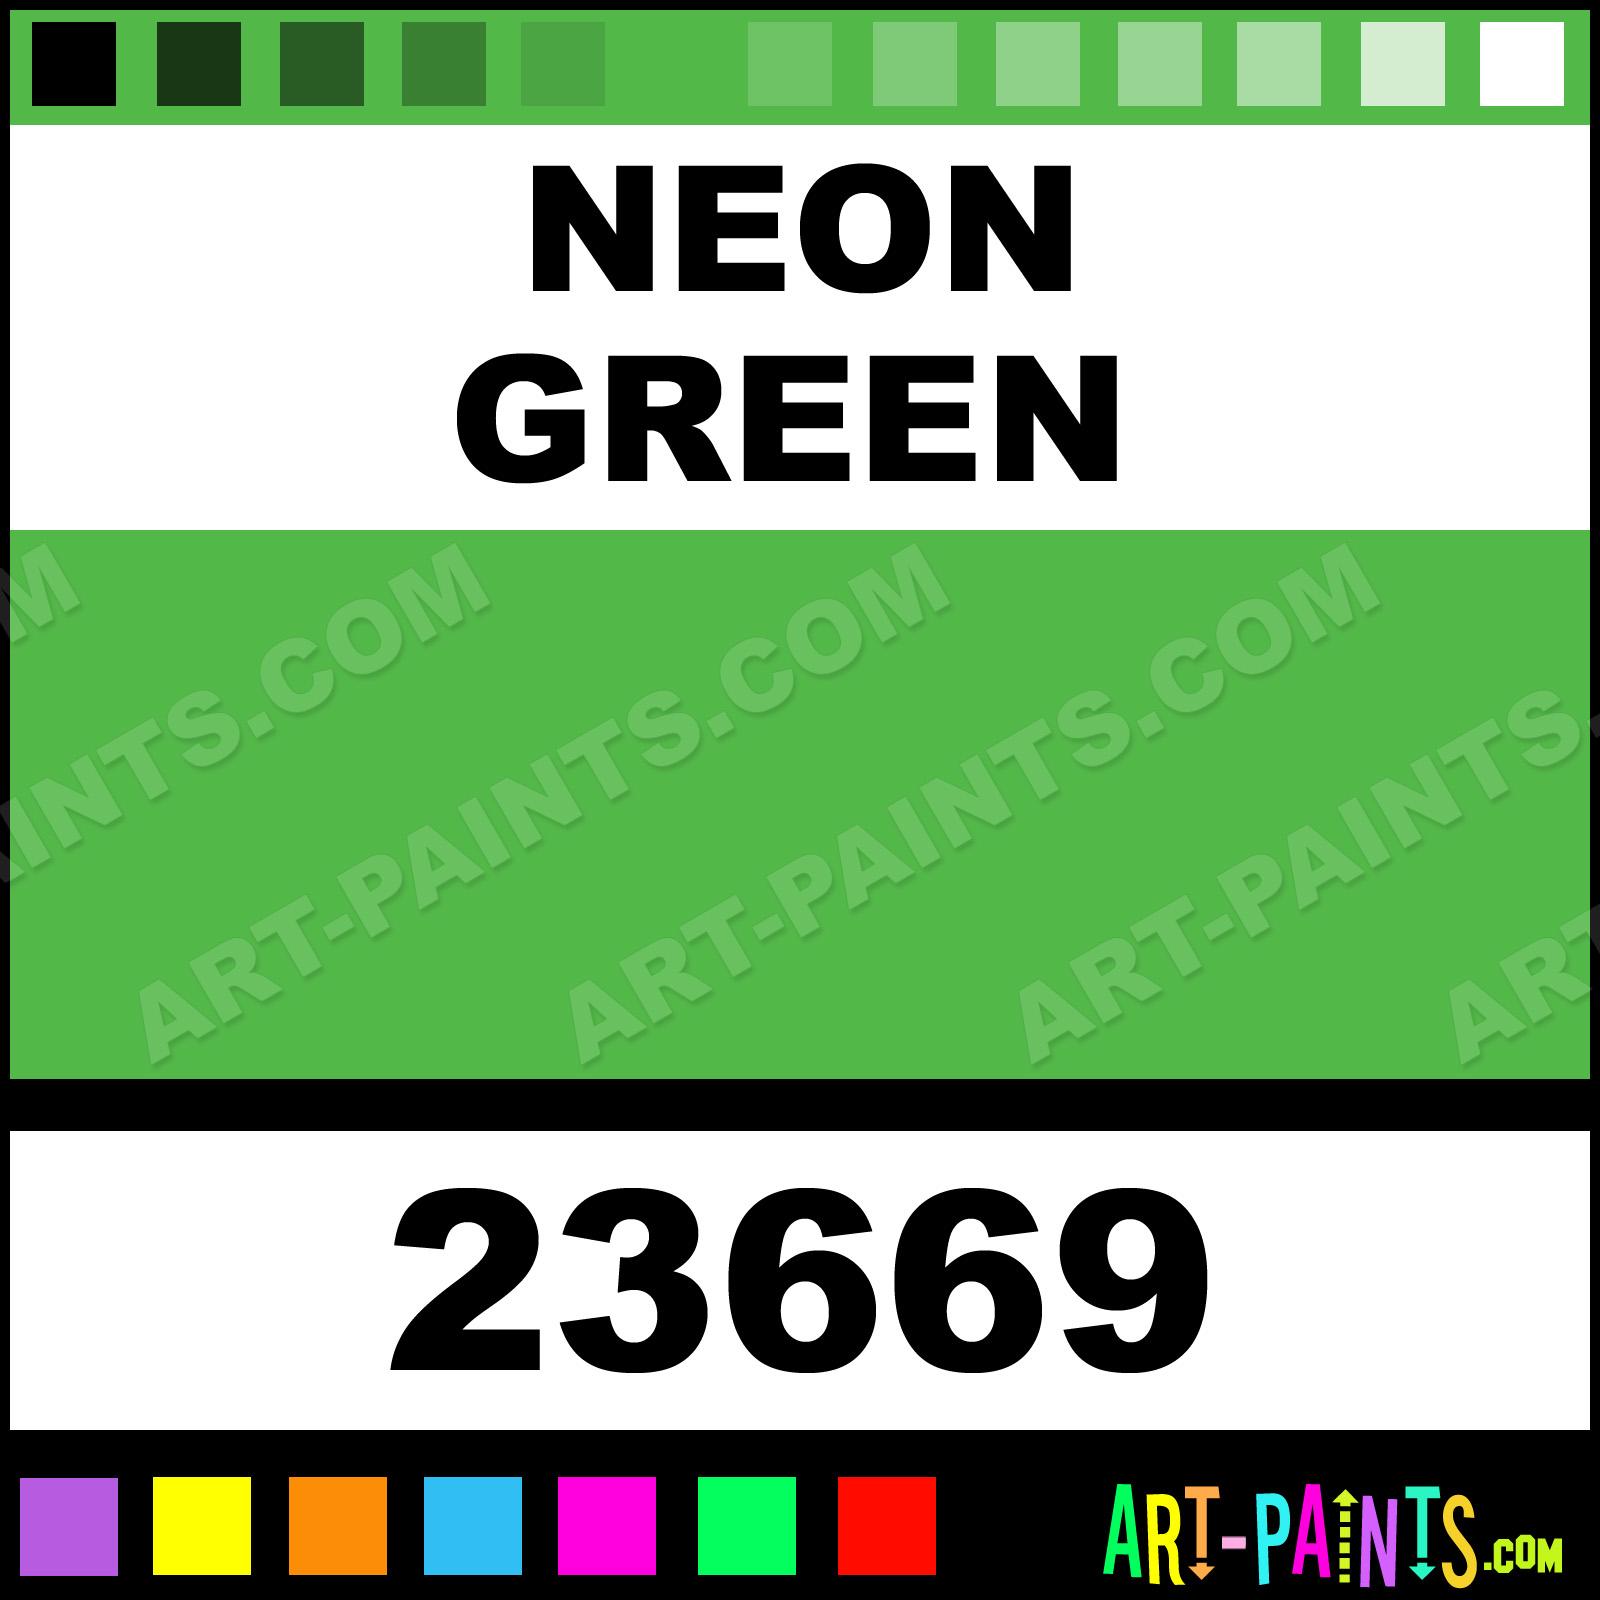 Craft Smart Paints Neon Green Artist Acrylic